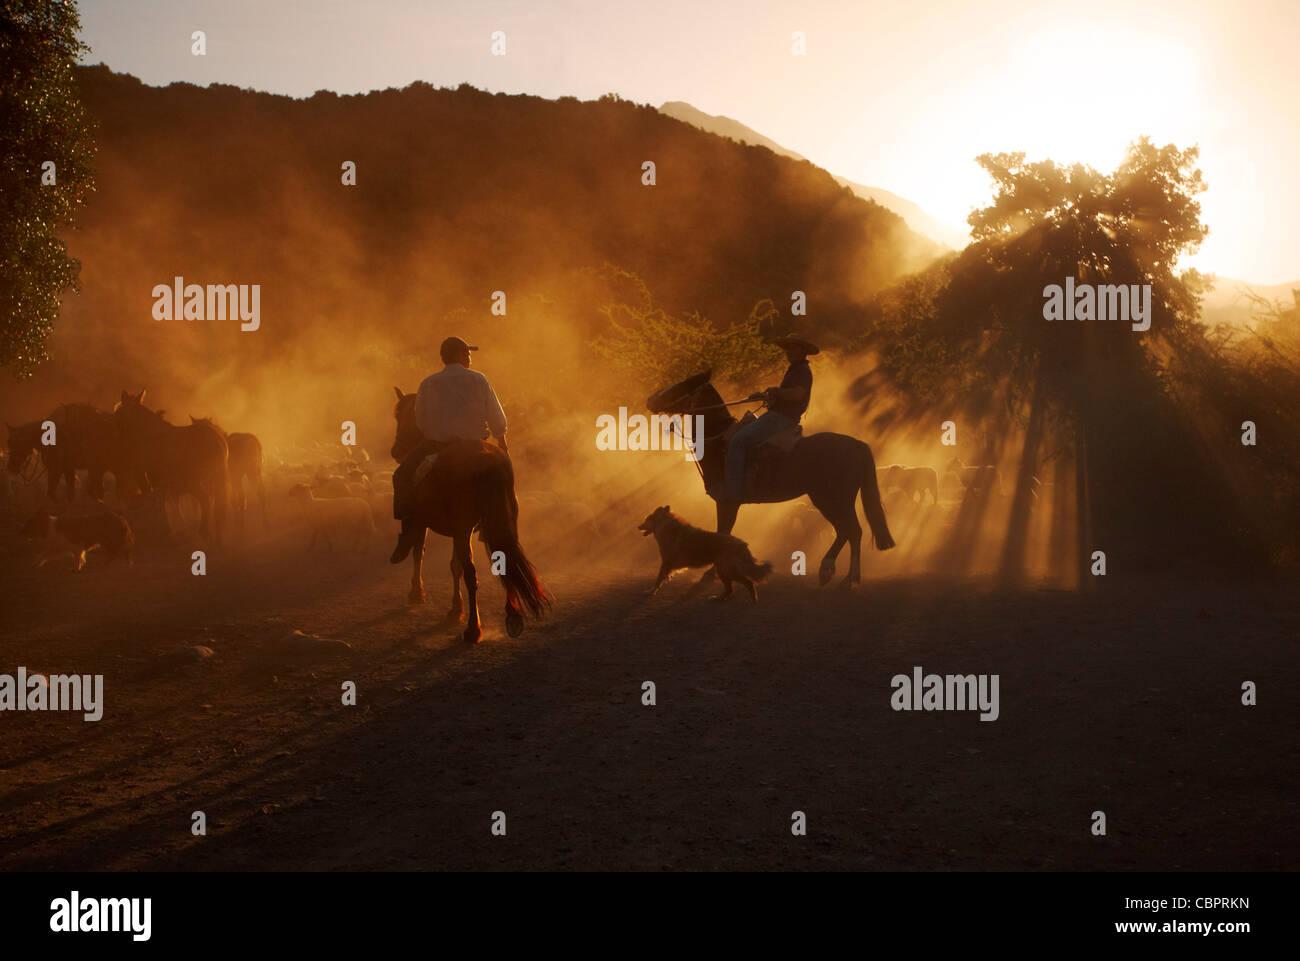 Huasos herding sheep at sunset in the Tumunan Valley, near San Fernando, Chile. - Stock Image